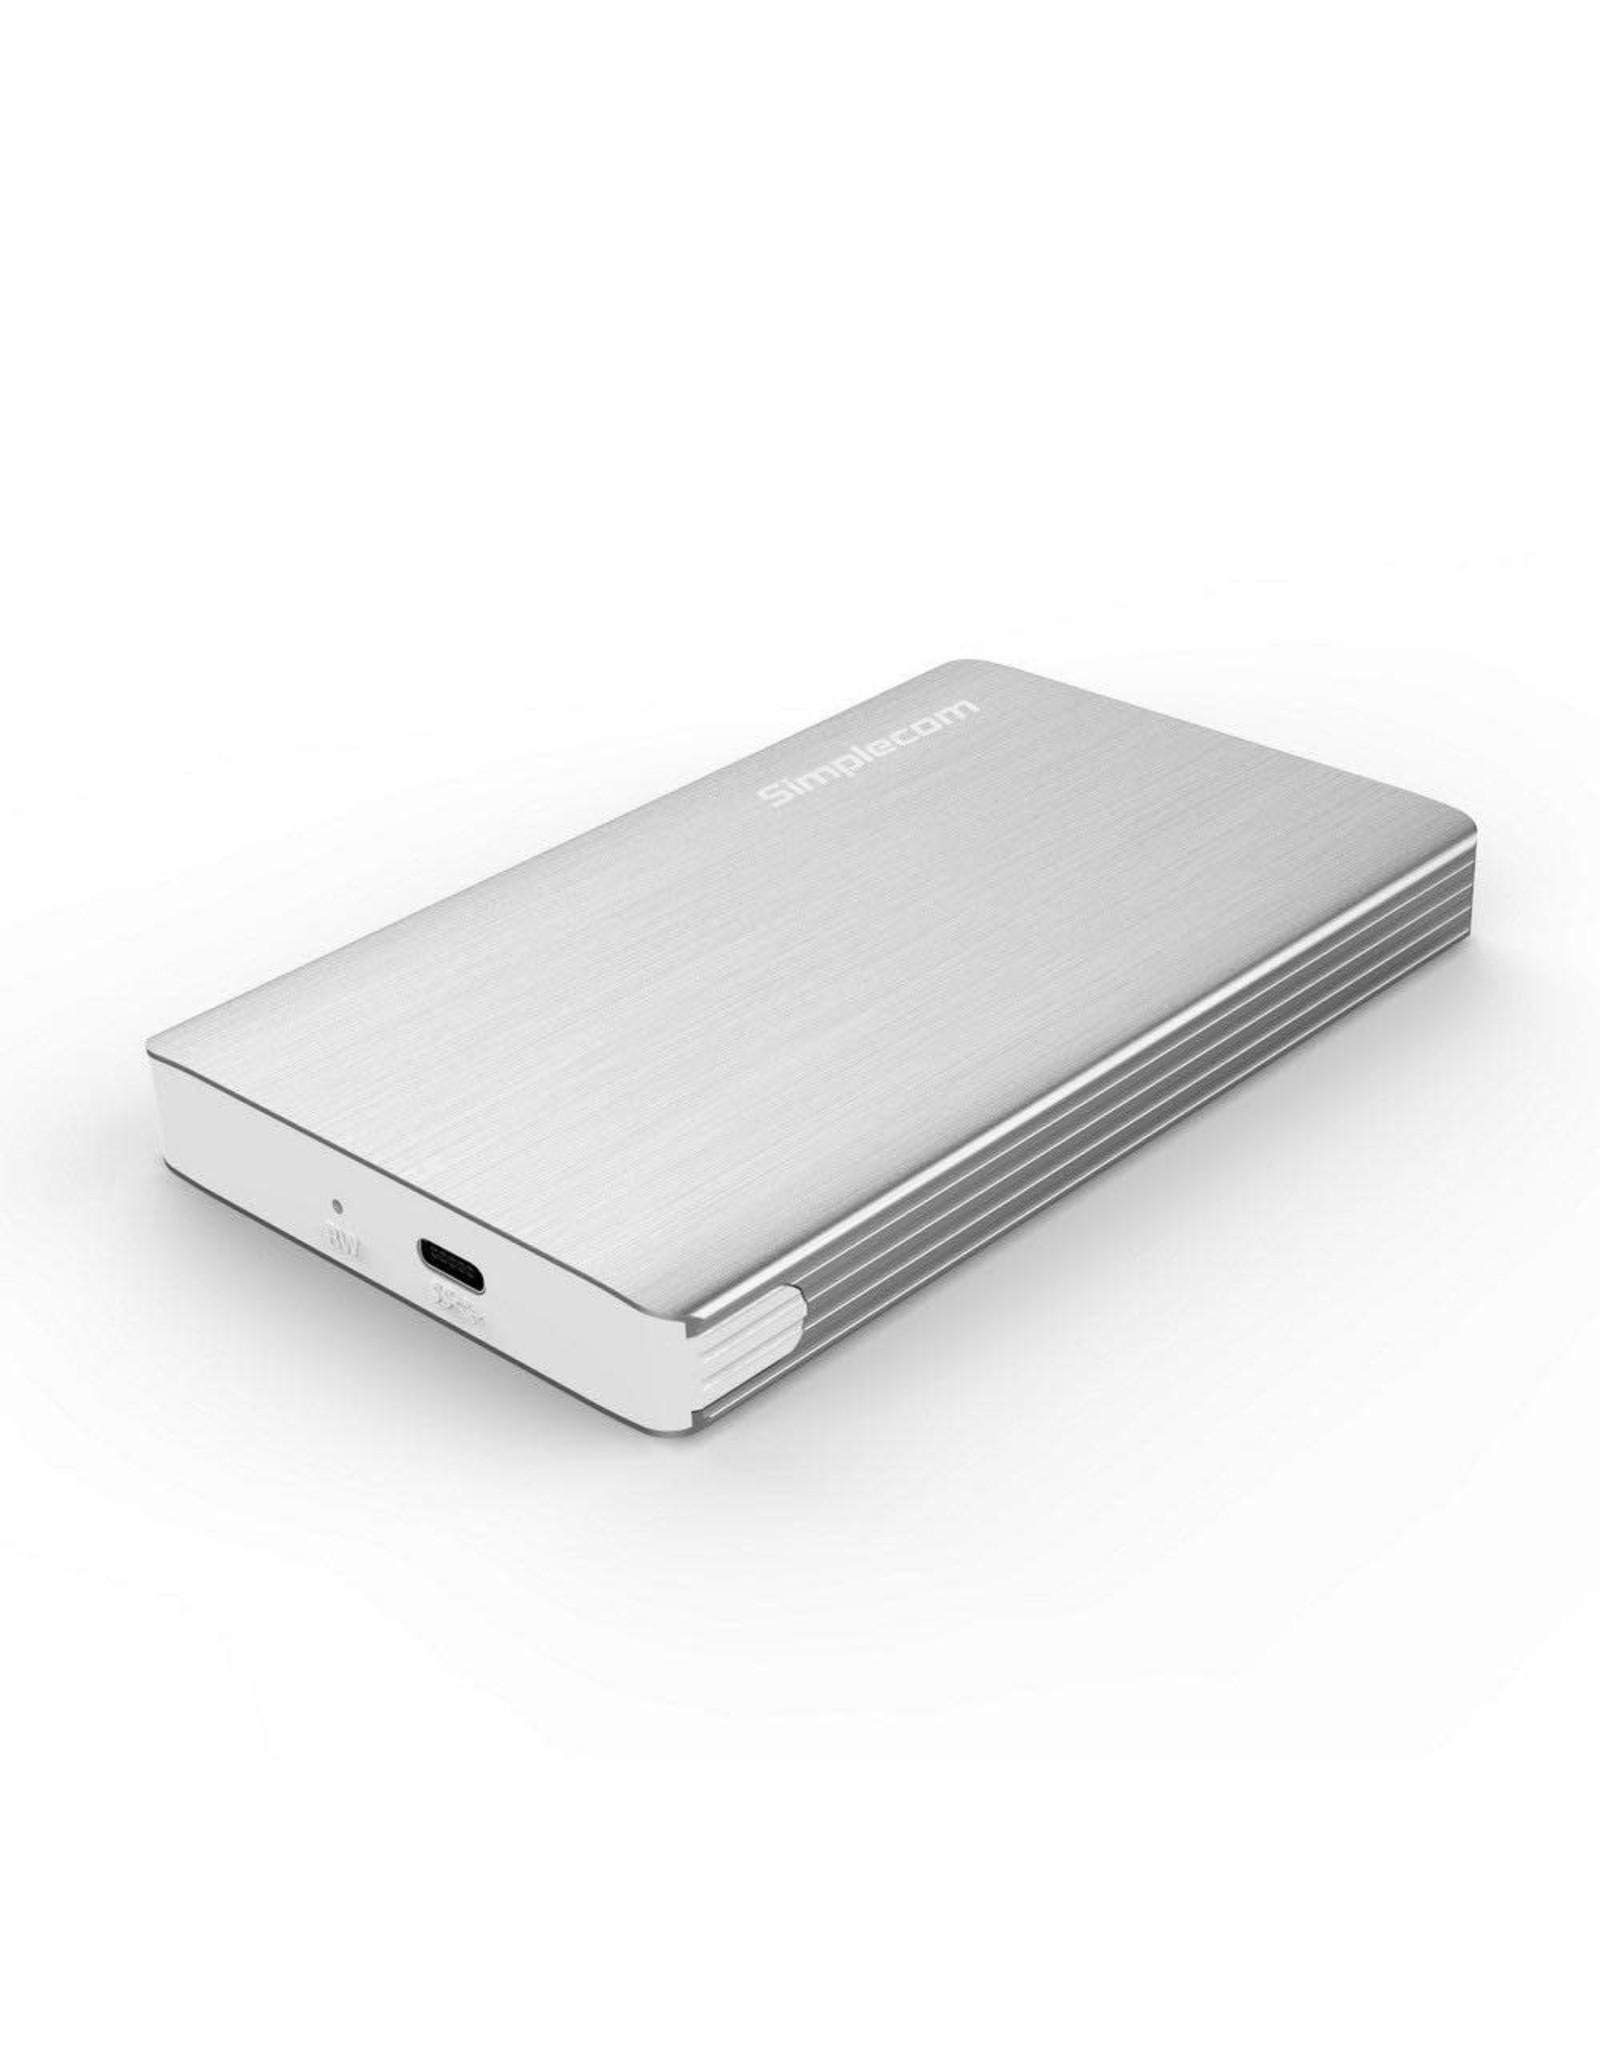 Simplecom Simplecom SE220 Aluminium Tool-Free 2.5'' SATA HDD/SSD to USB-C Enclosure - SILVER